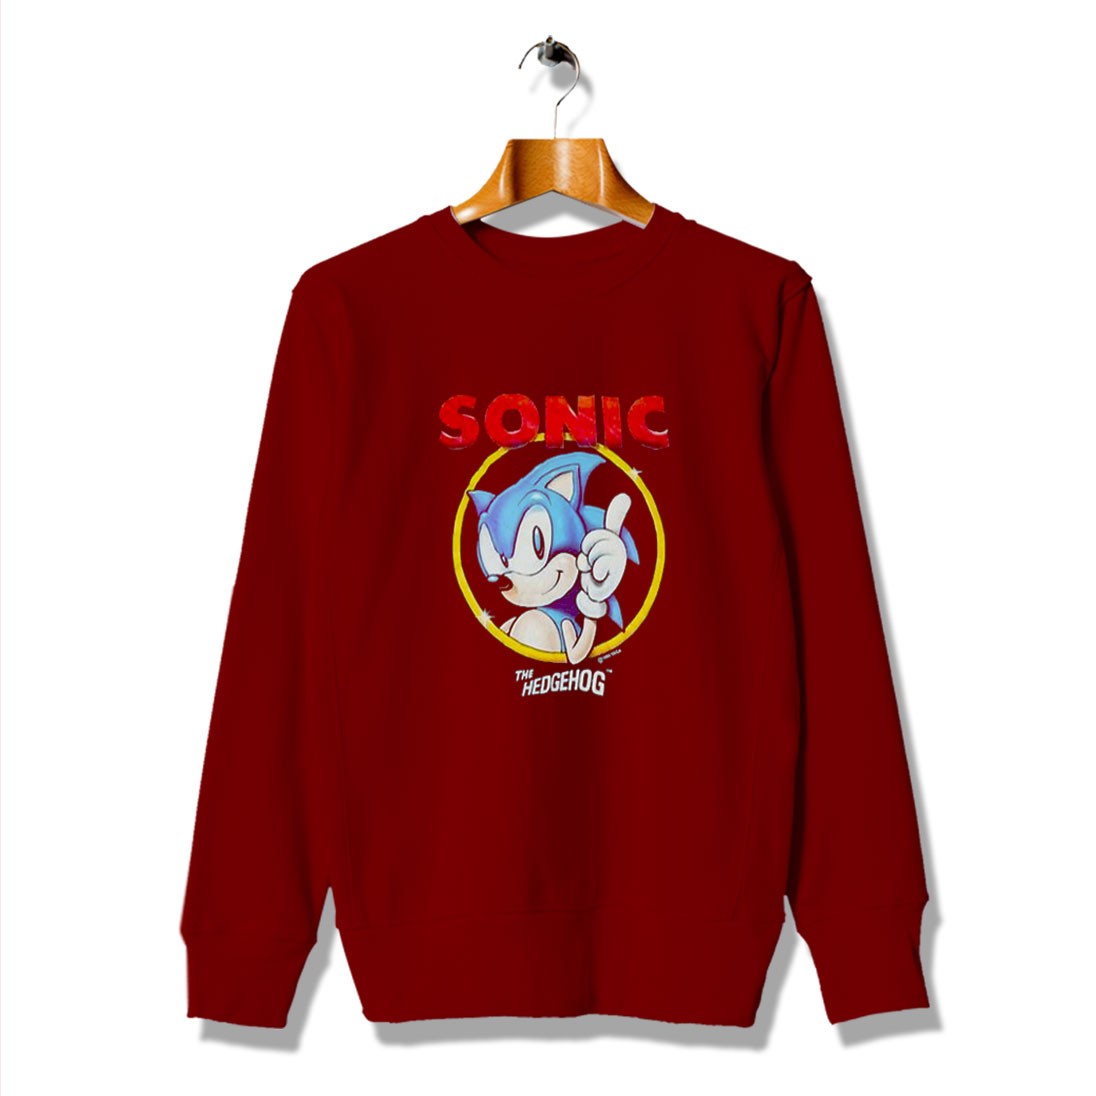 Cool Art Ideas Sonic The Hedgehog Vintage Sweatshirt Bigvero Com